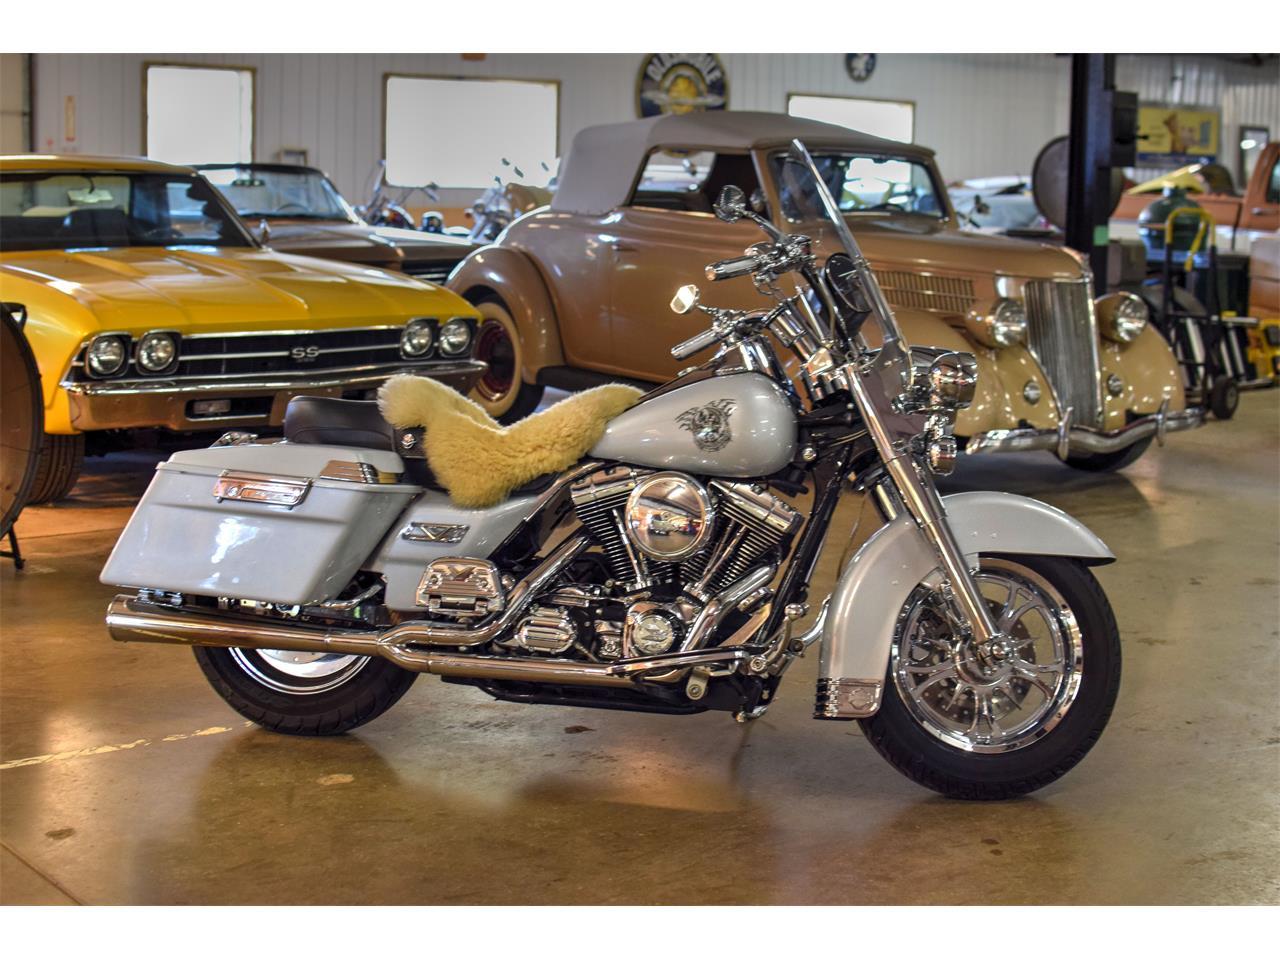 2003 Harley-Davidson Road King (CC-1008703) for sale in Watertown, Minnesota